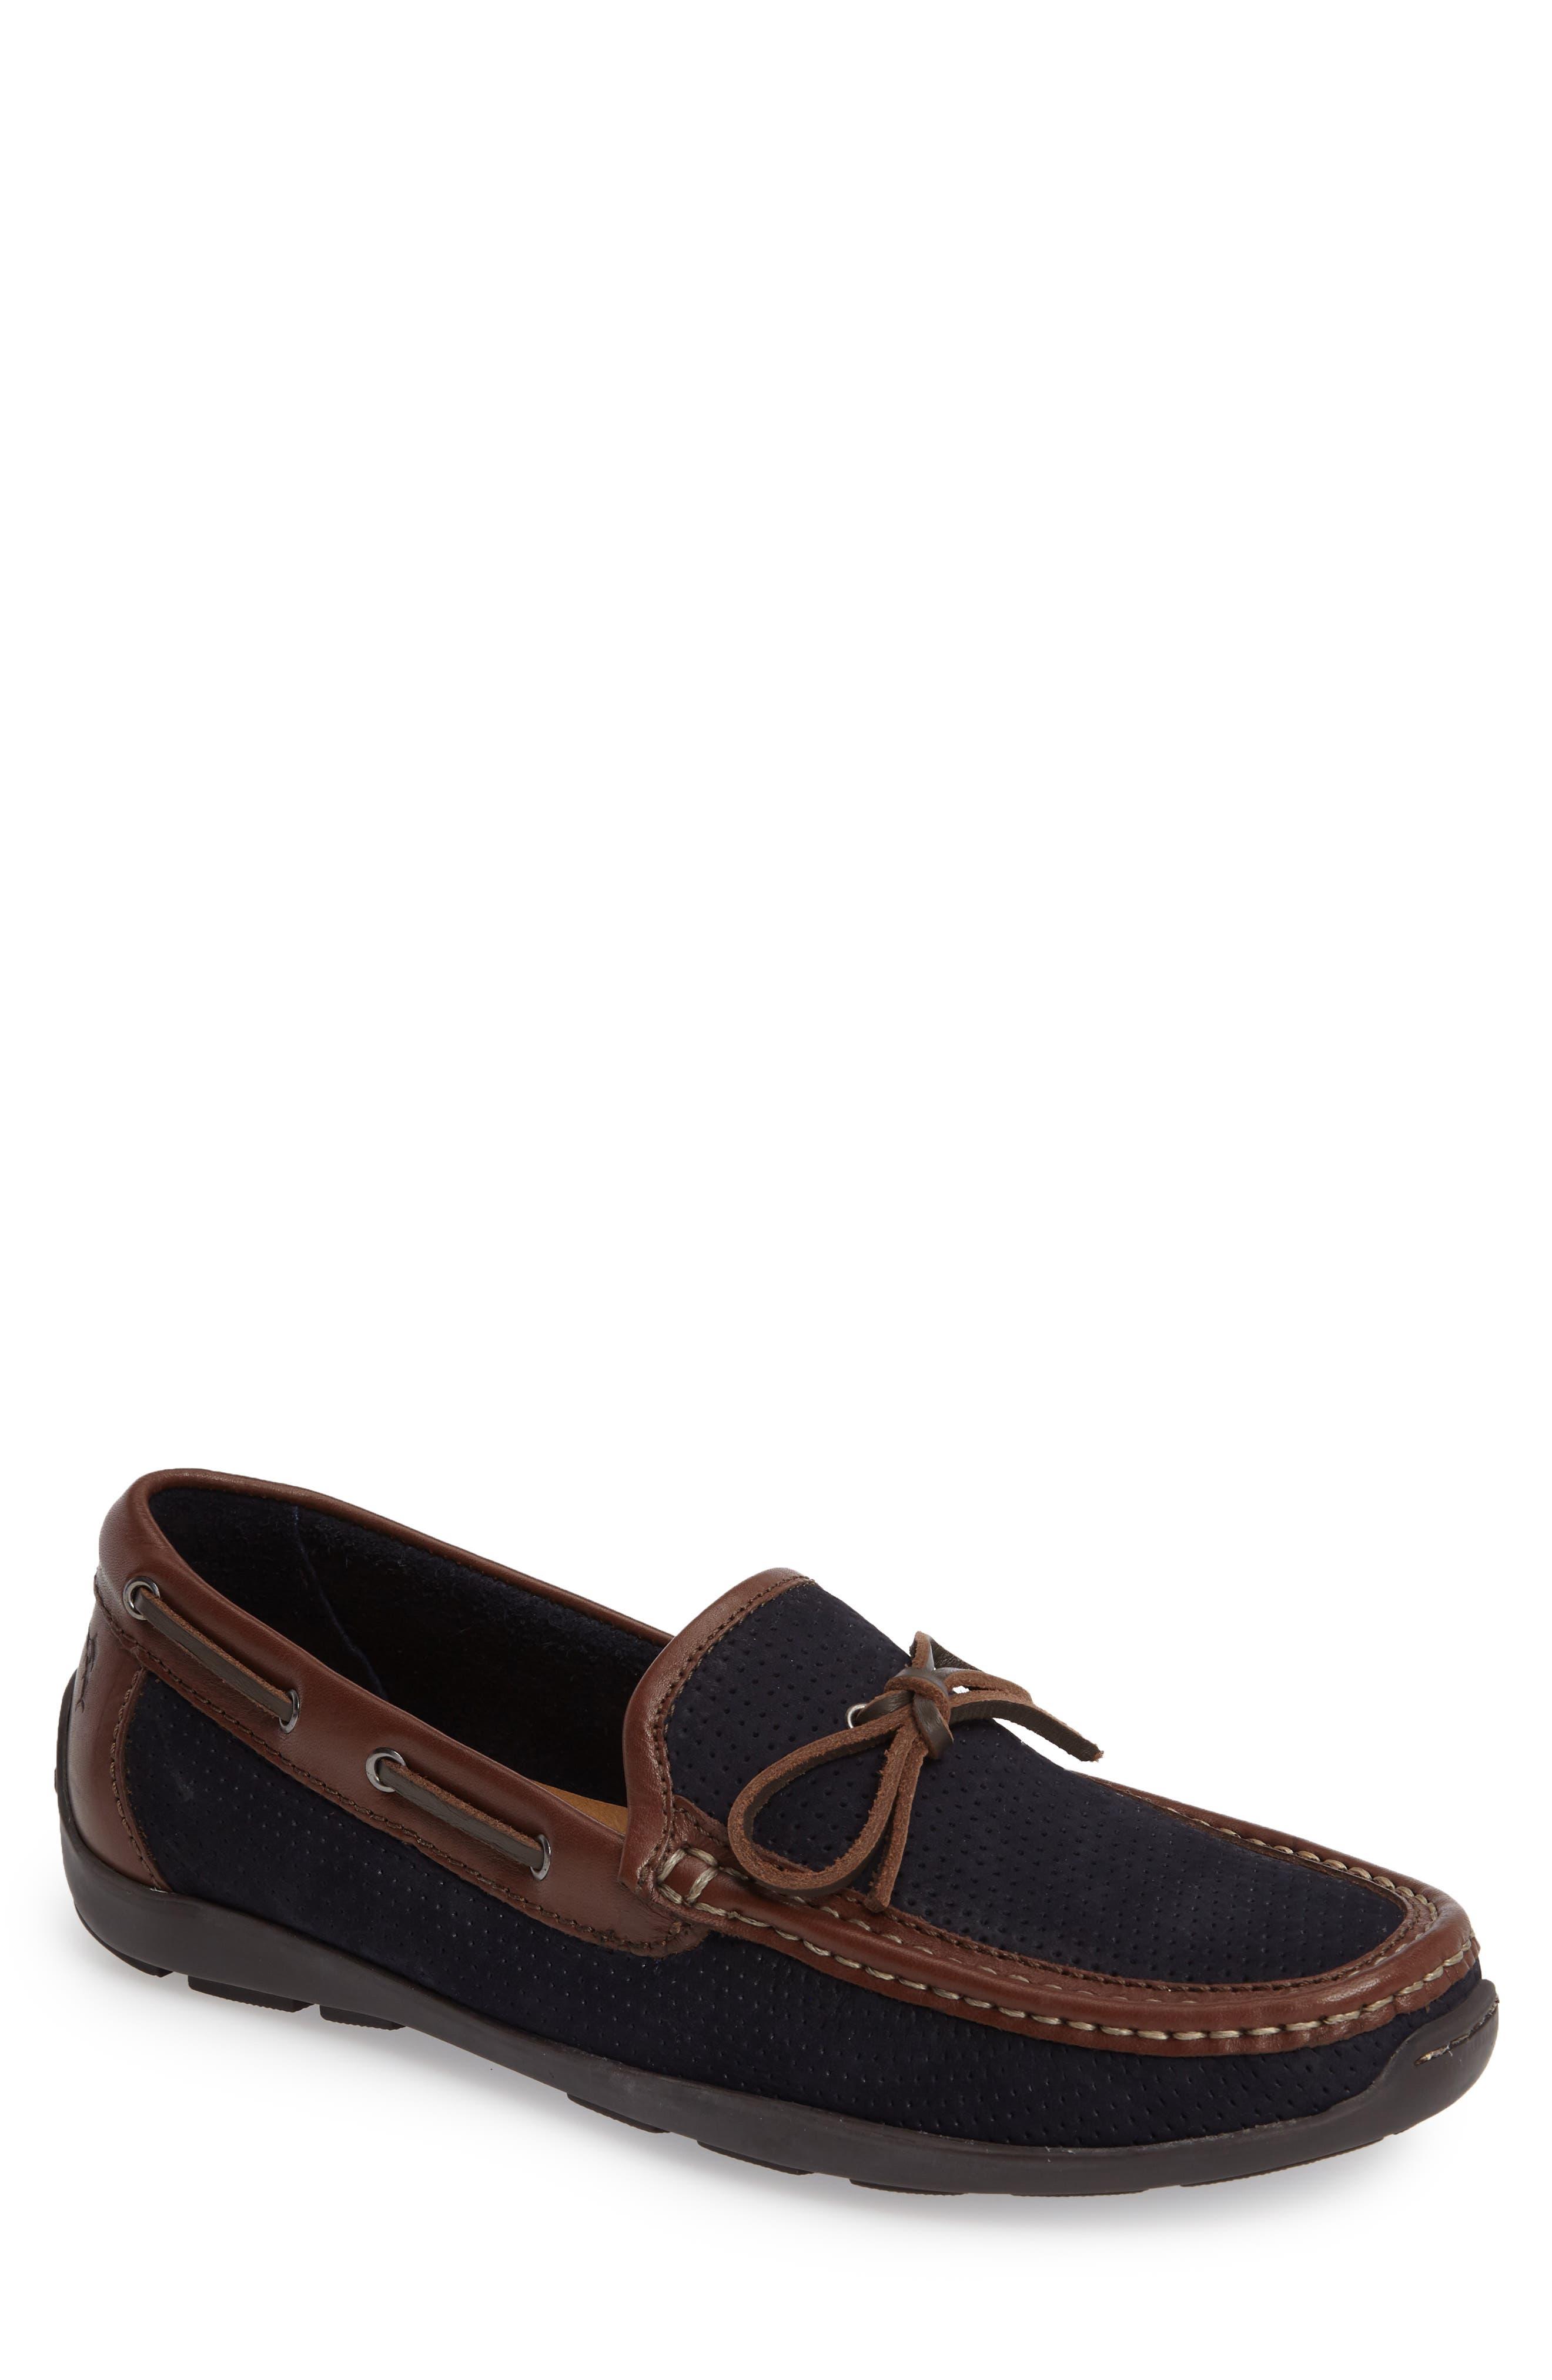 Alternate Image 1 Selected - Tommy Bahama Odinn Driving Shoe (Men)